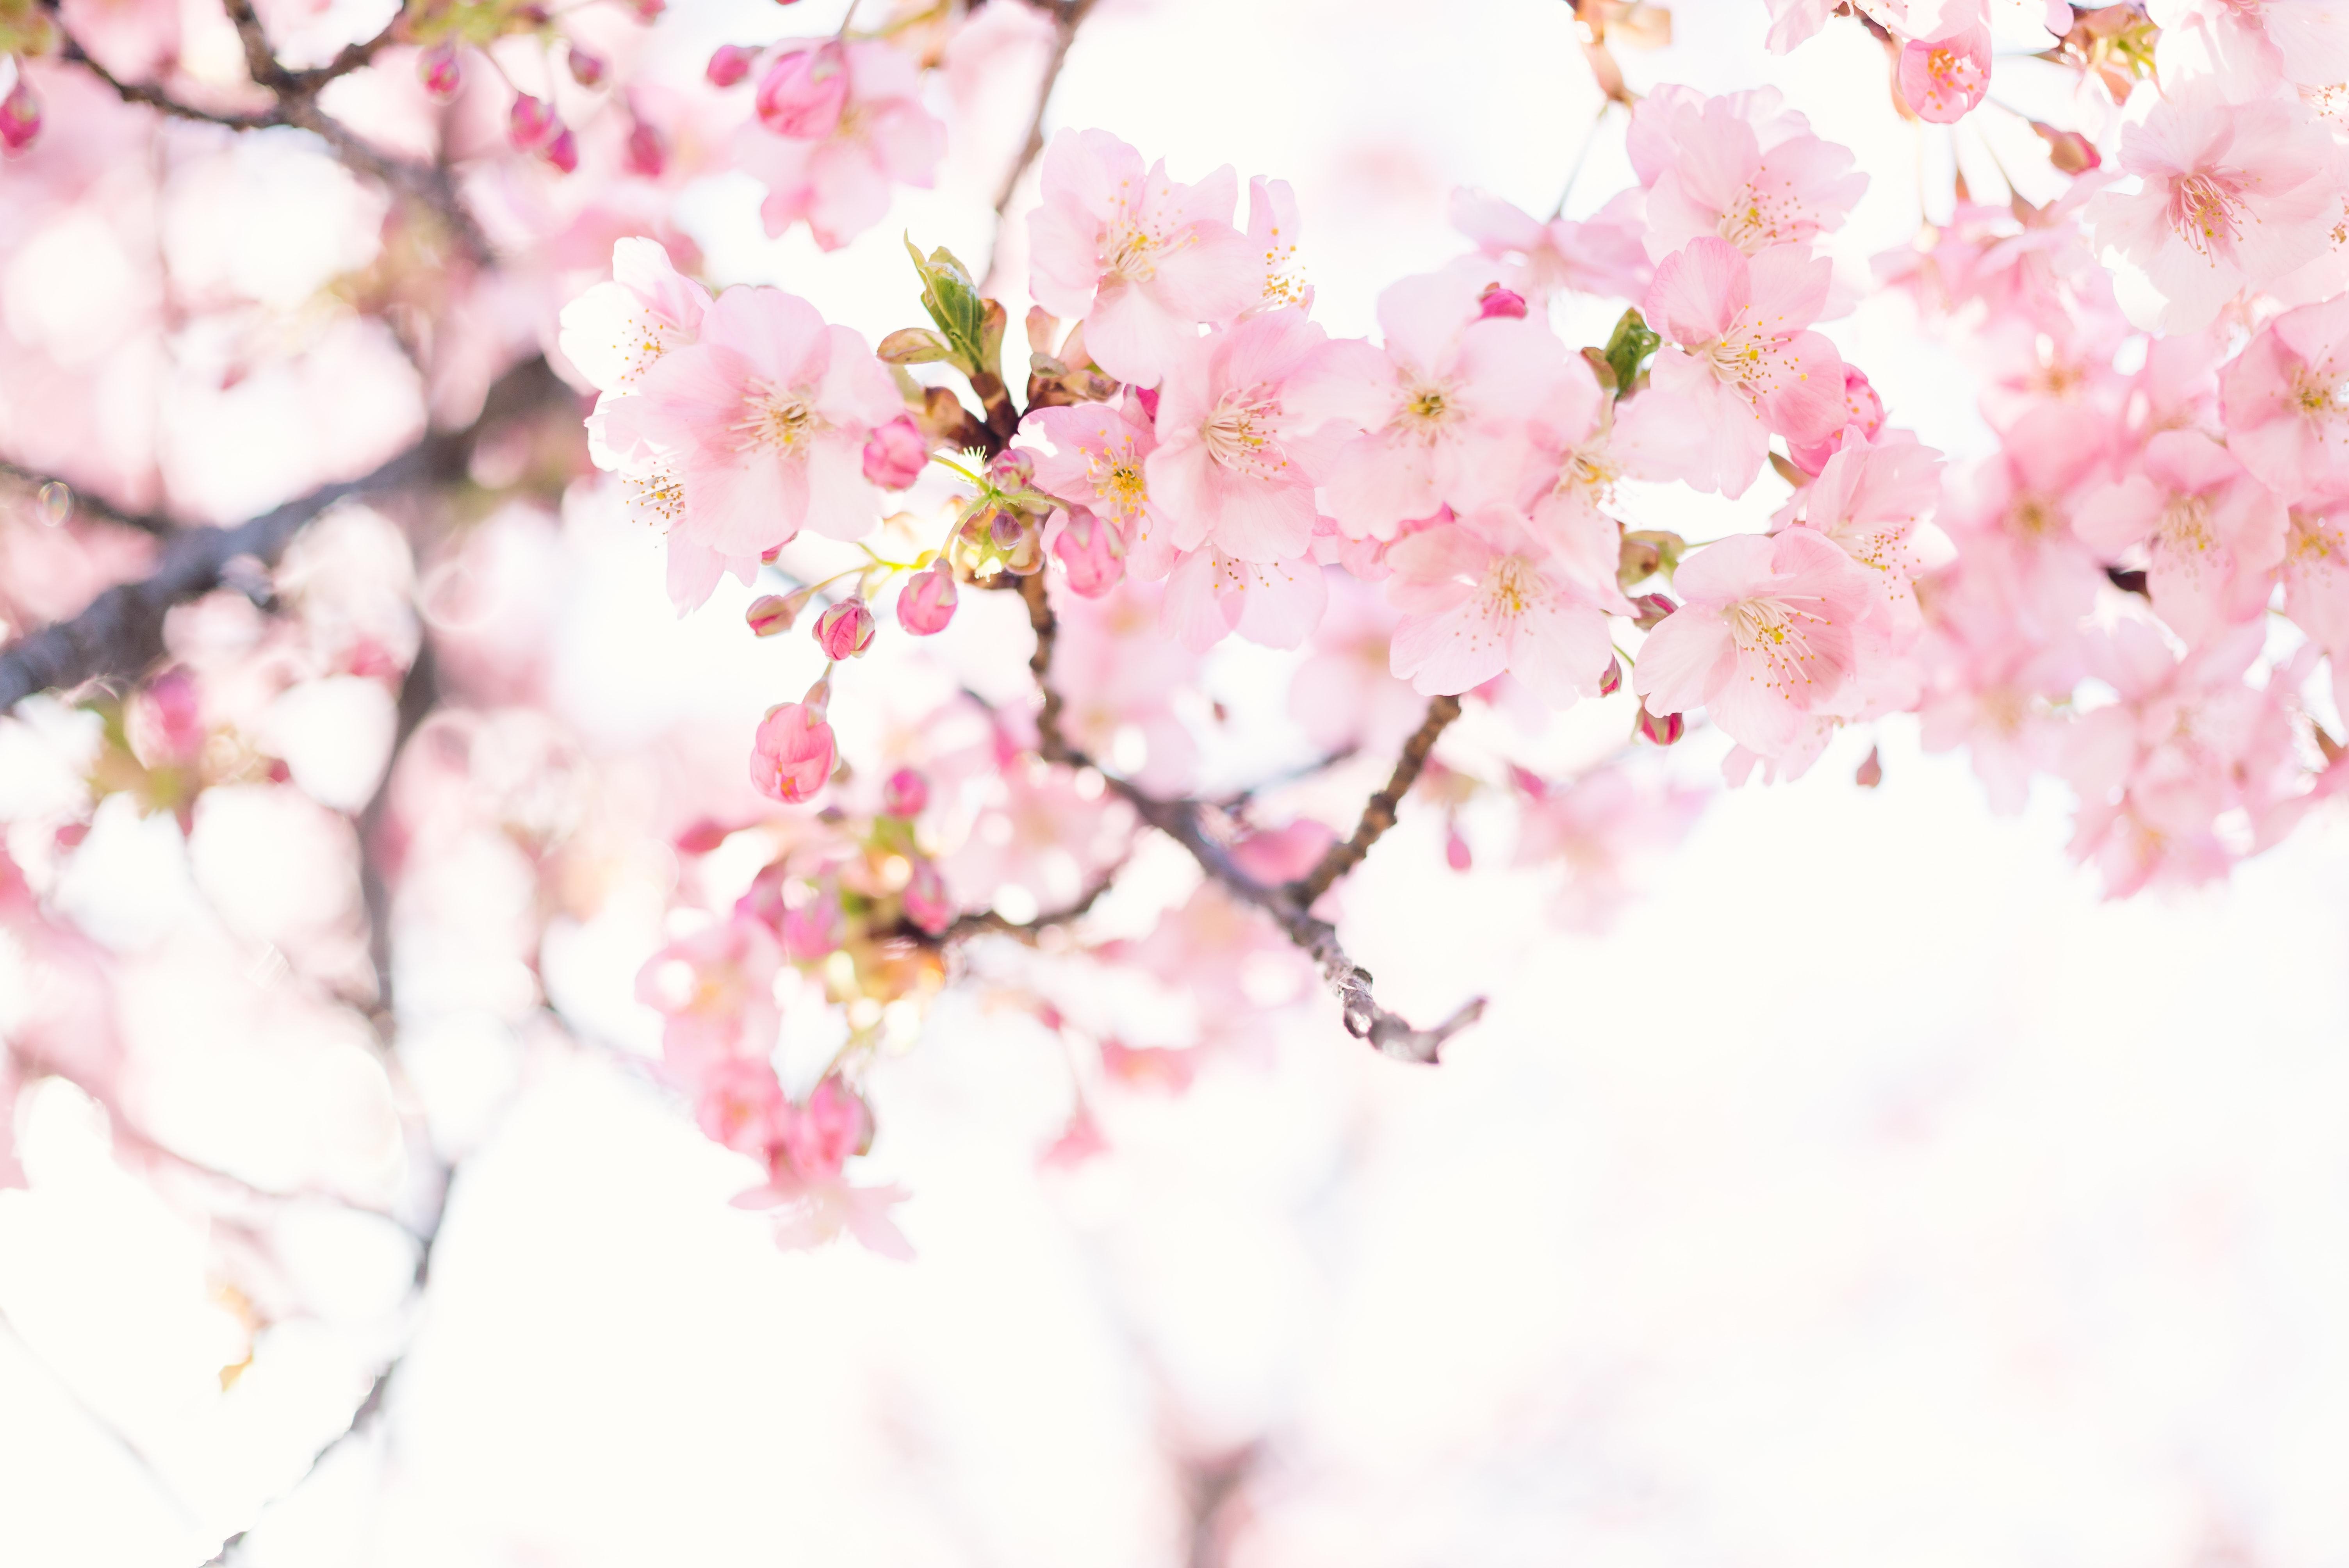 masaaki-komori-_SbeCWYjwCQ-unsplash.jpg